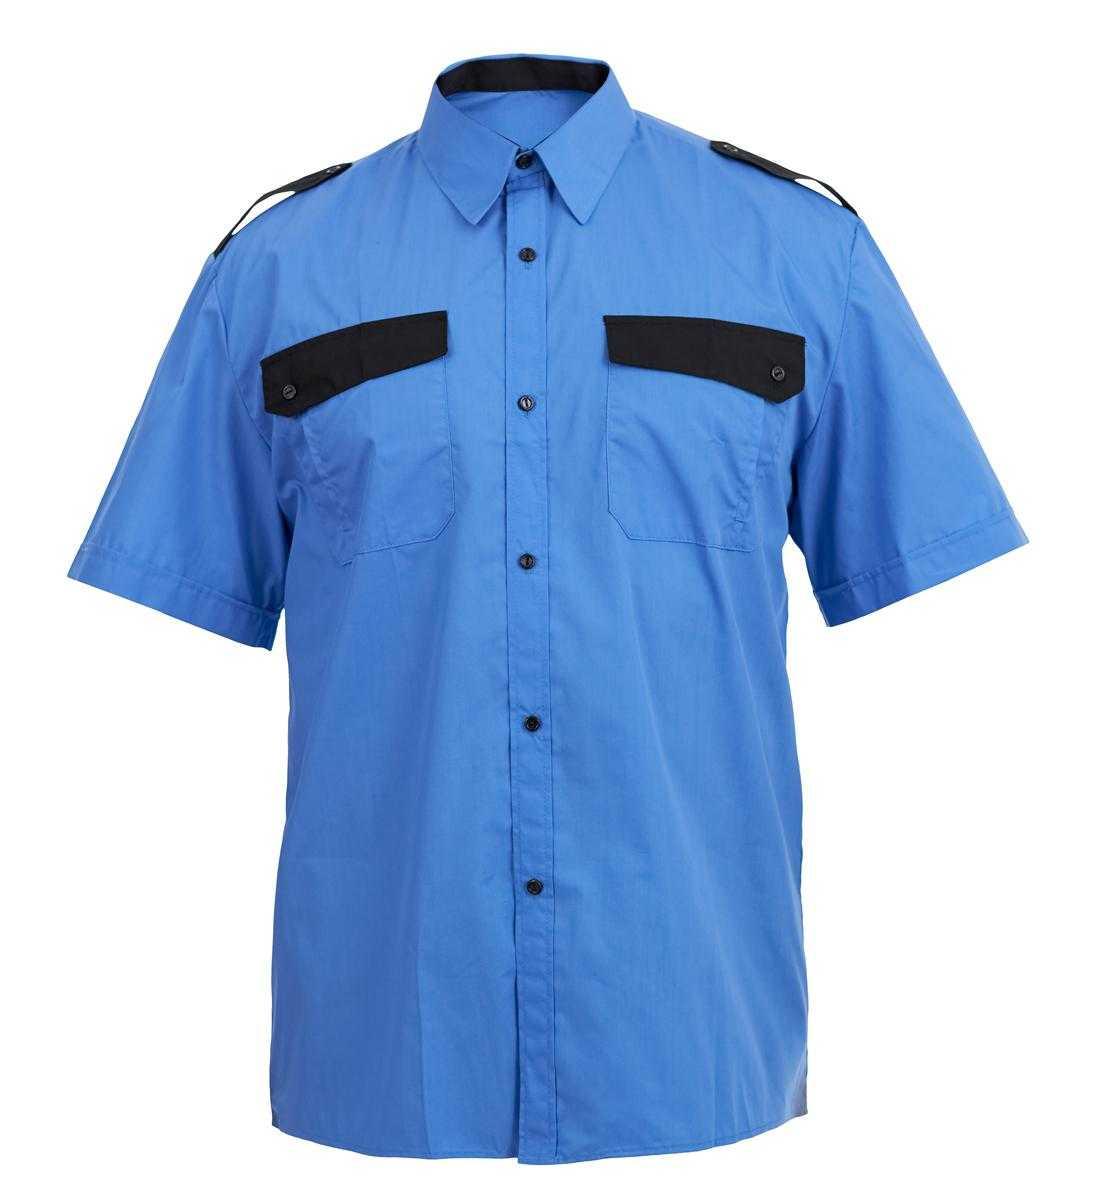 Img013444 - Рубашка охранника с коротким рукавом, цв. голубой